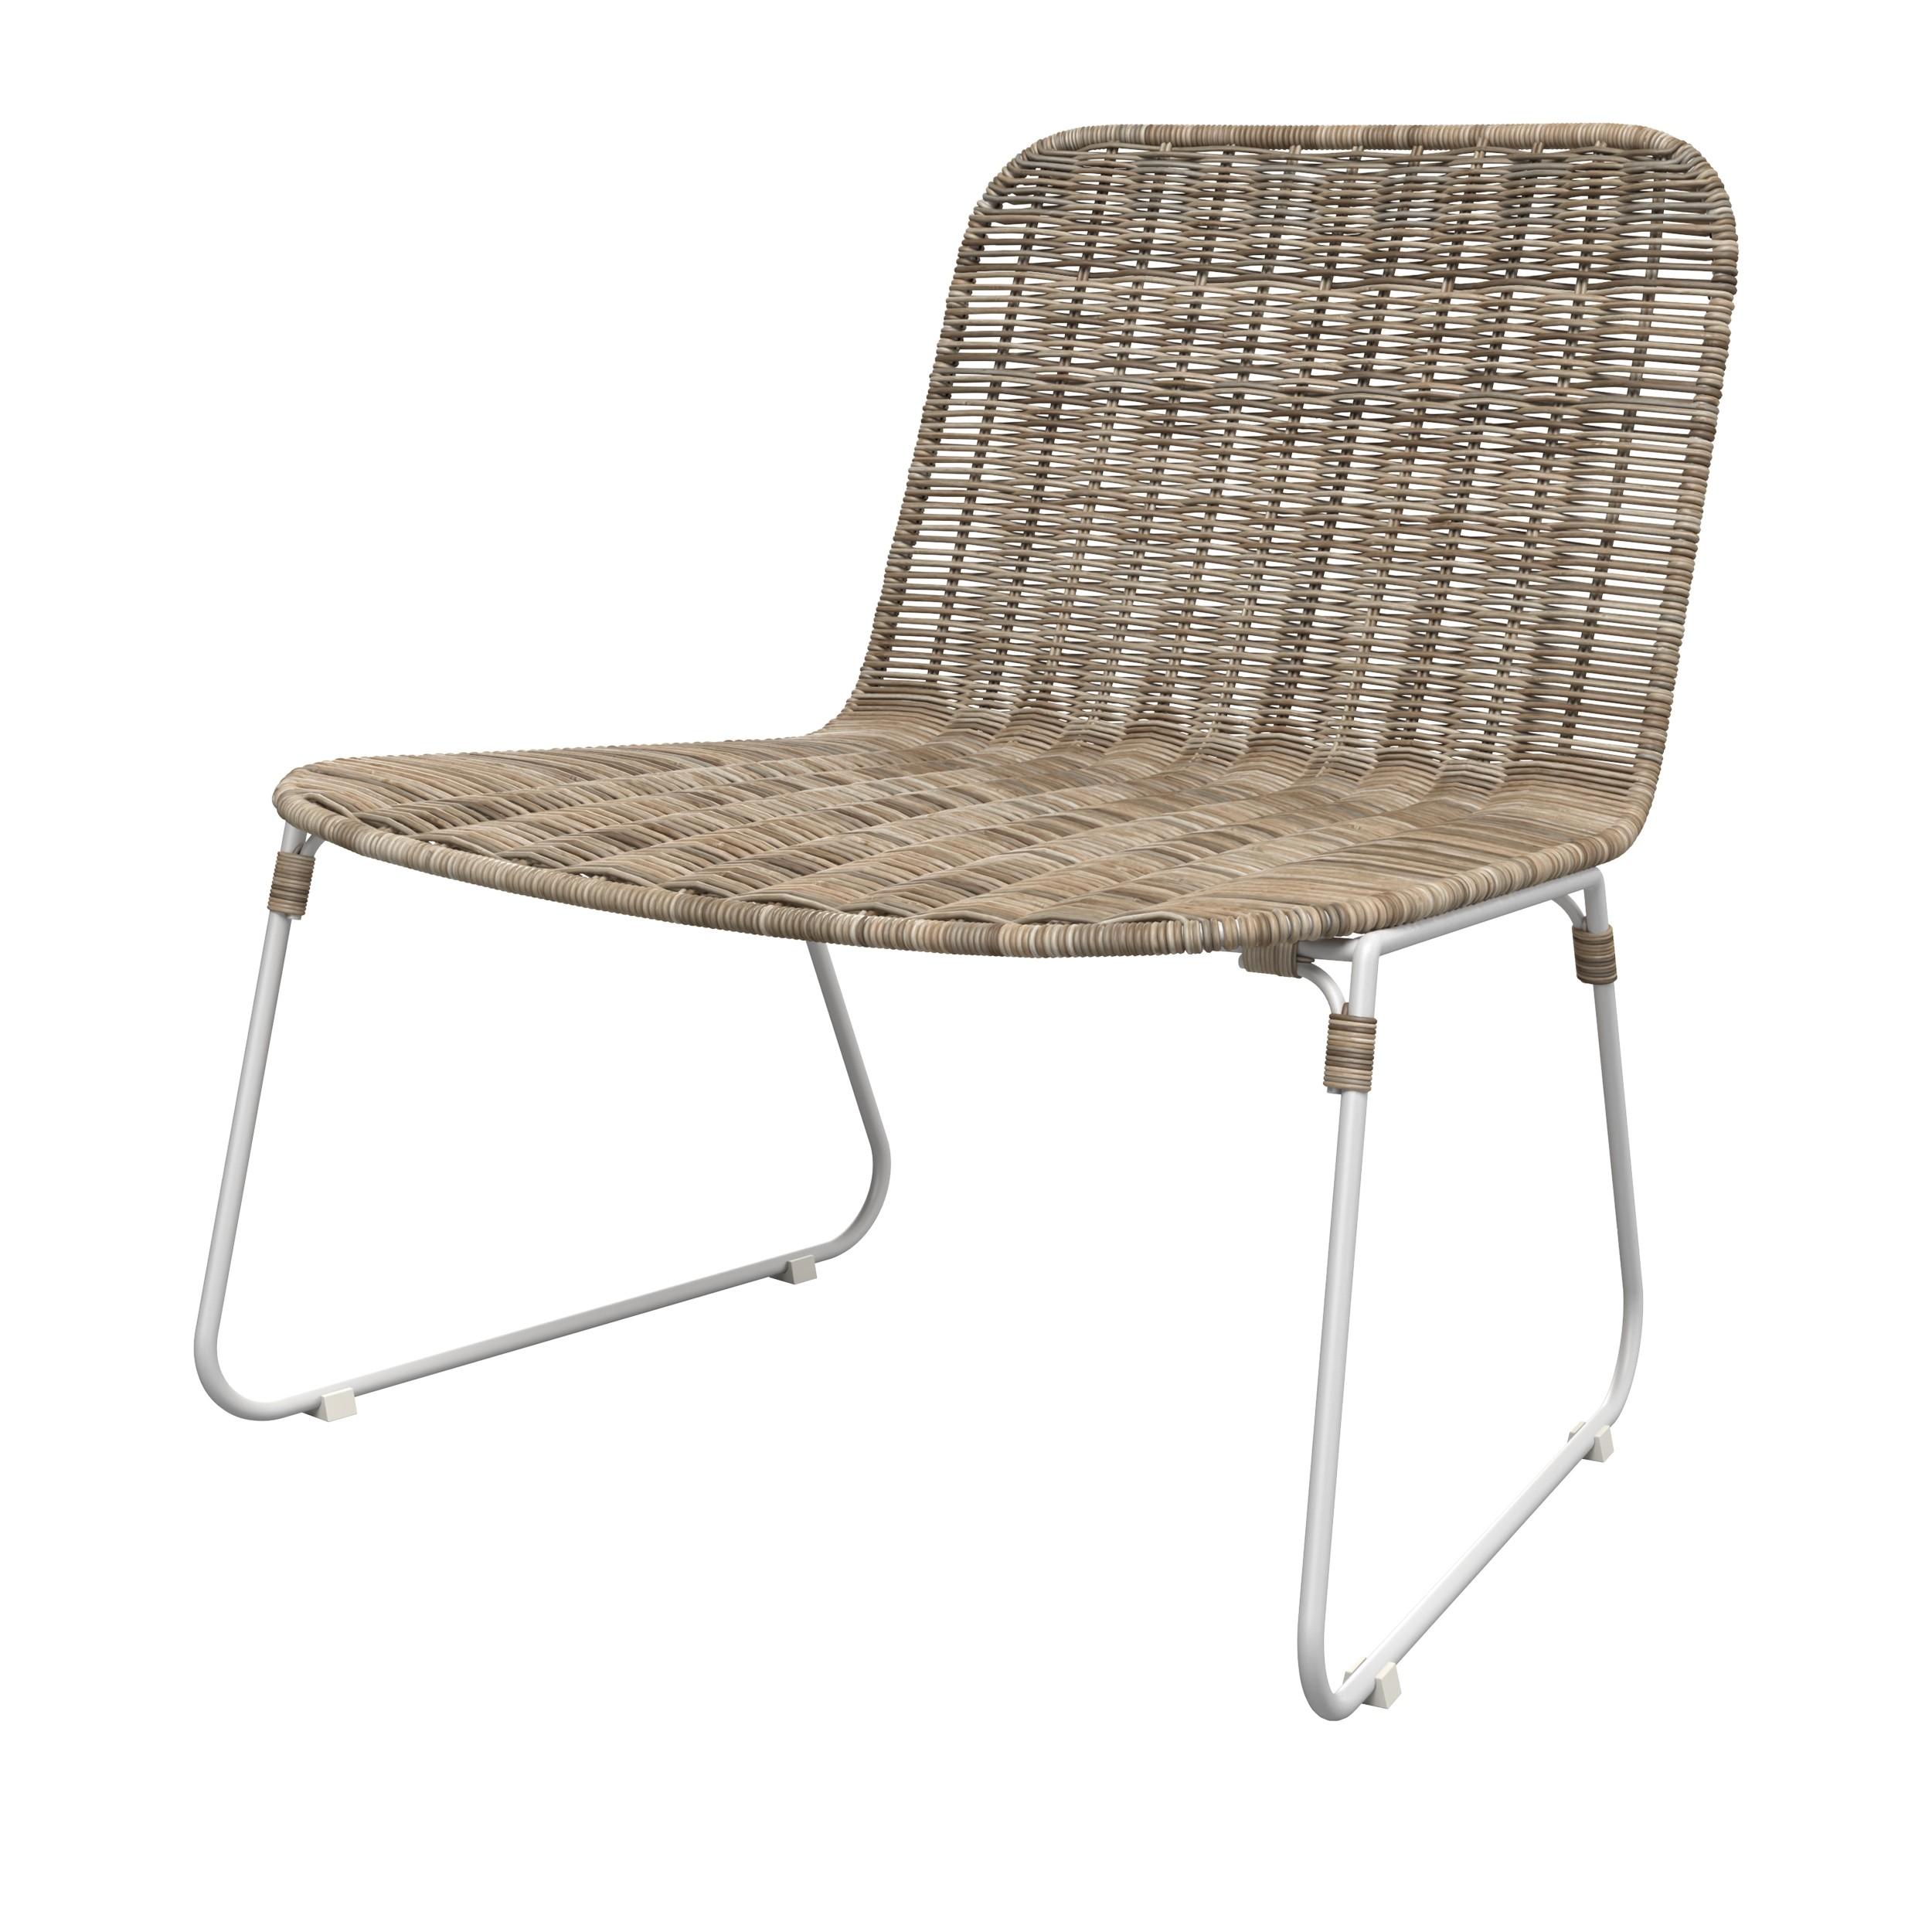 acheter fauteuil de jardin bas confort tresse